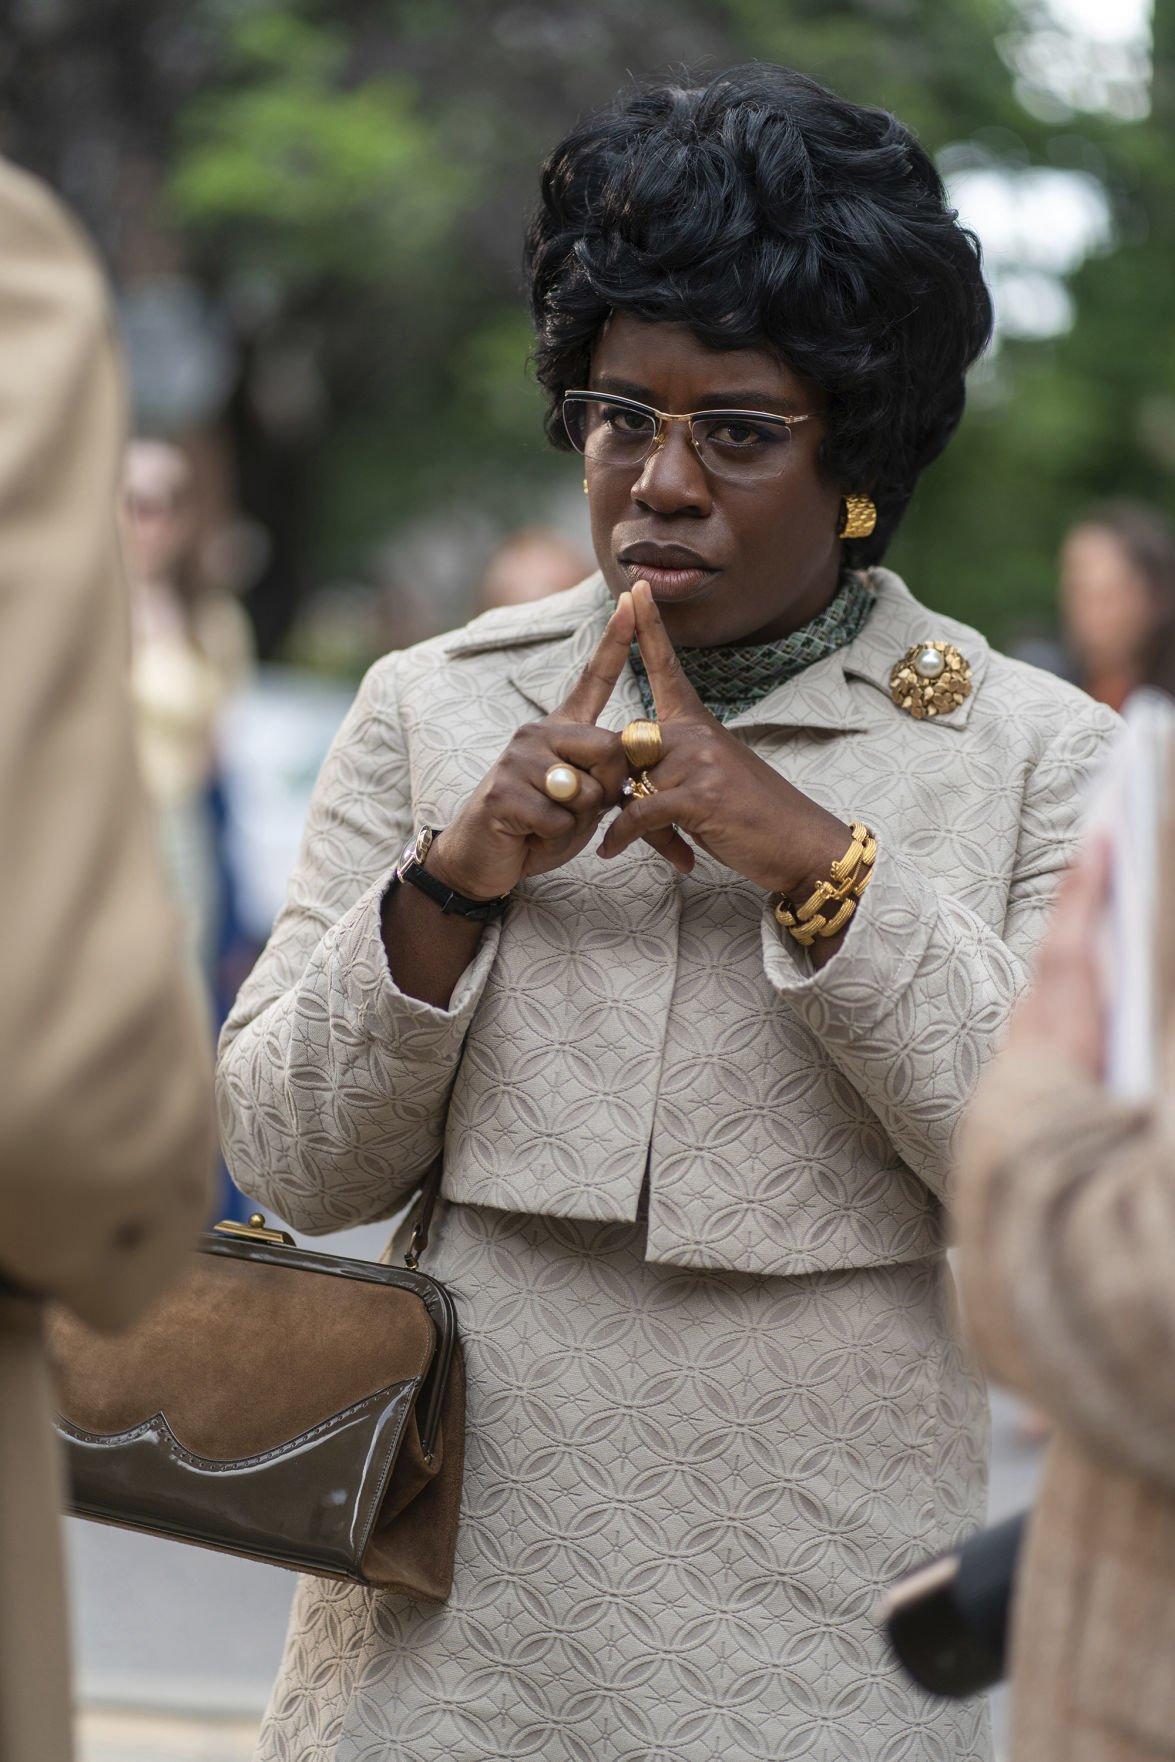 People-Uzo Aduba as Shirley Chisholm